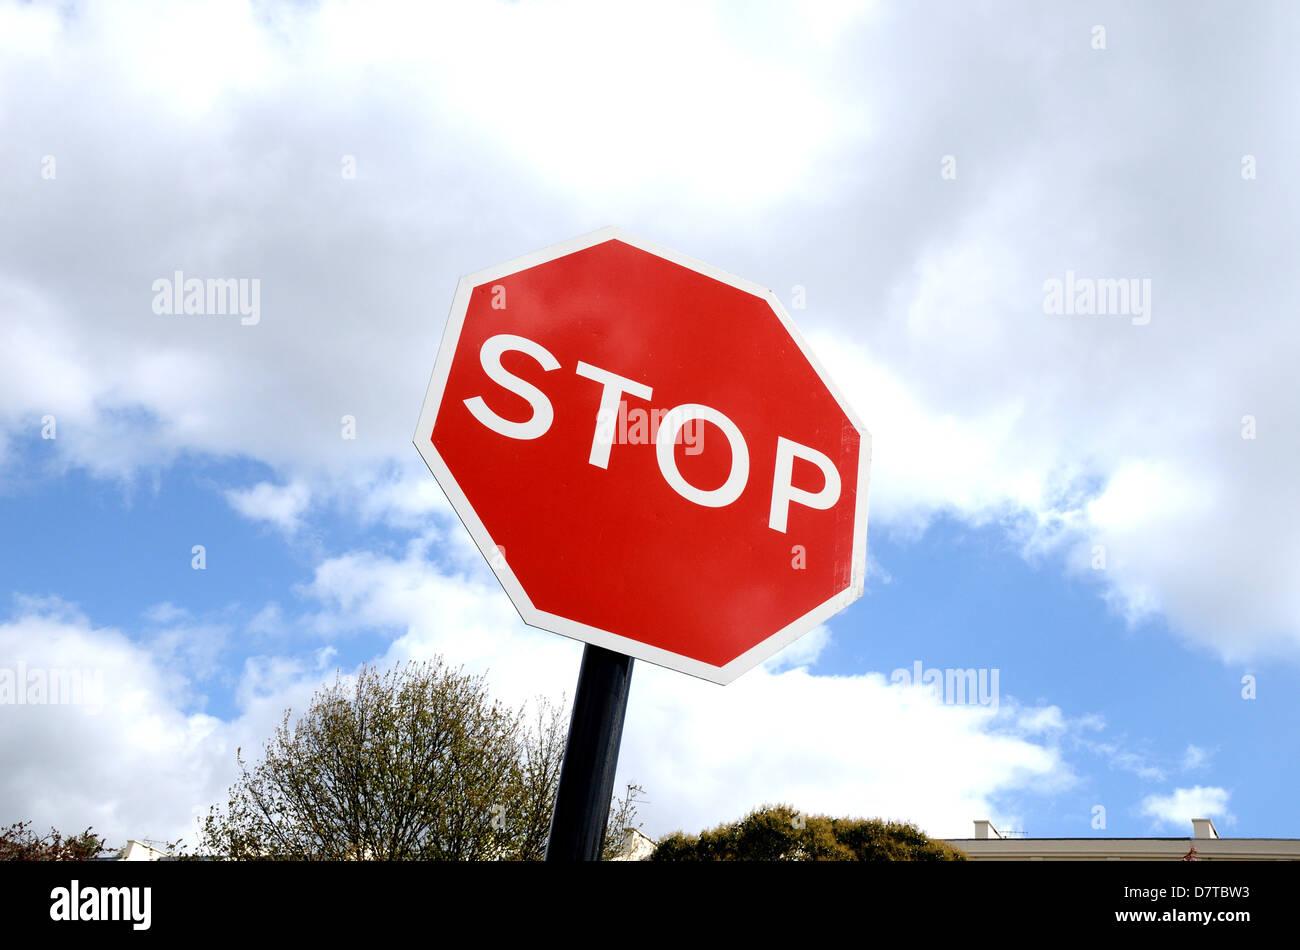 British highway Stop traffic sign - Stock Image